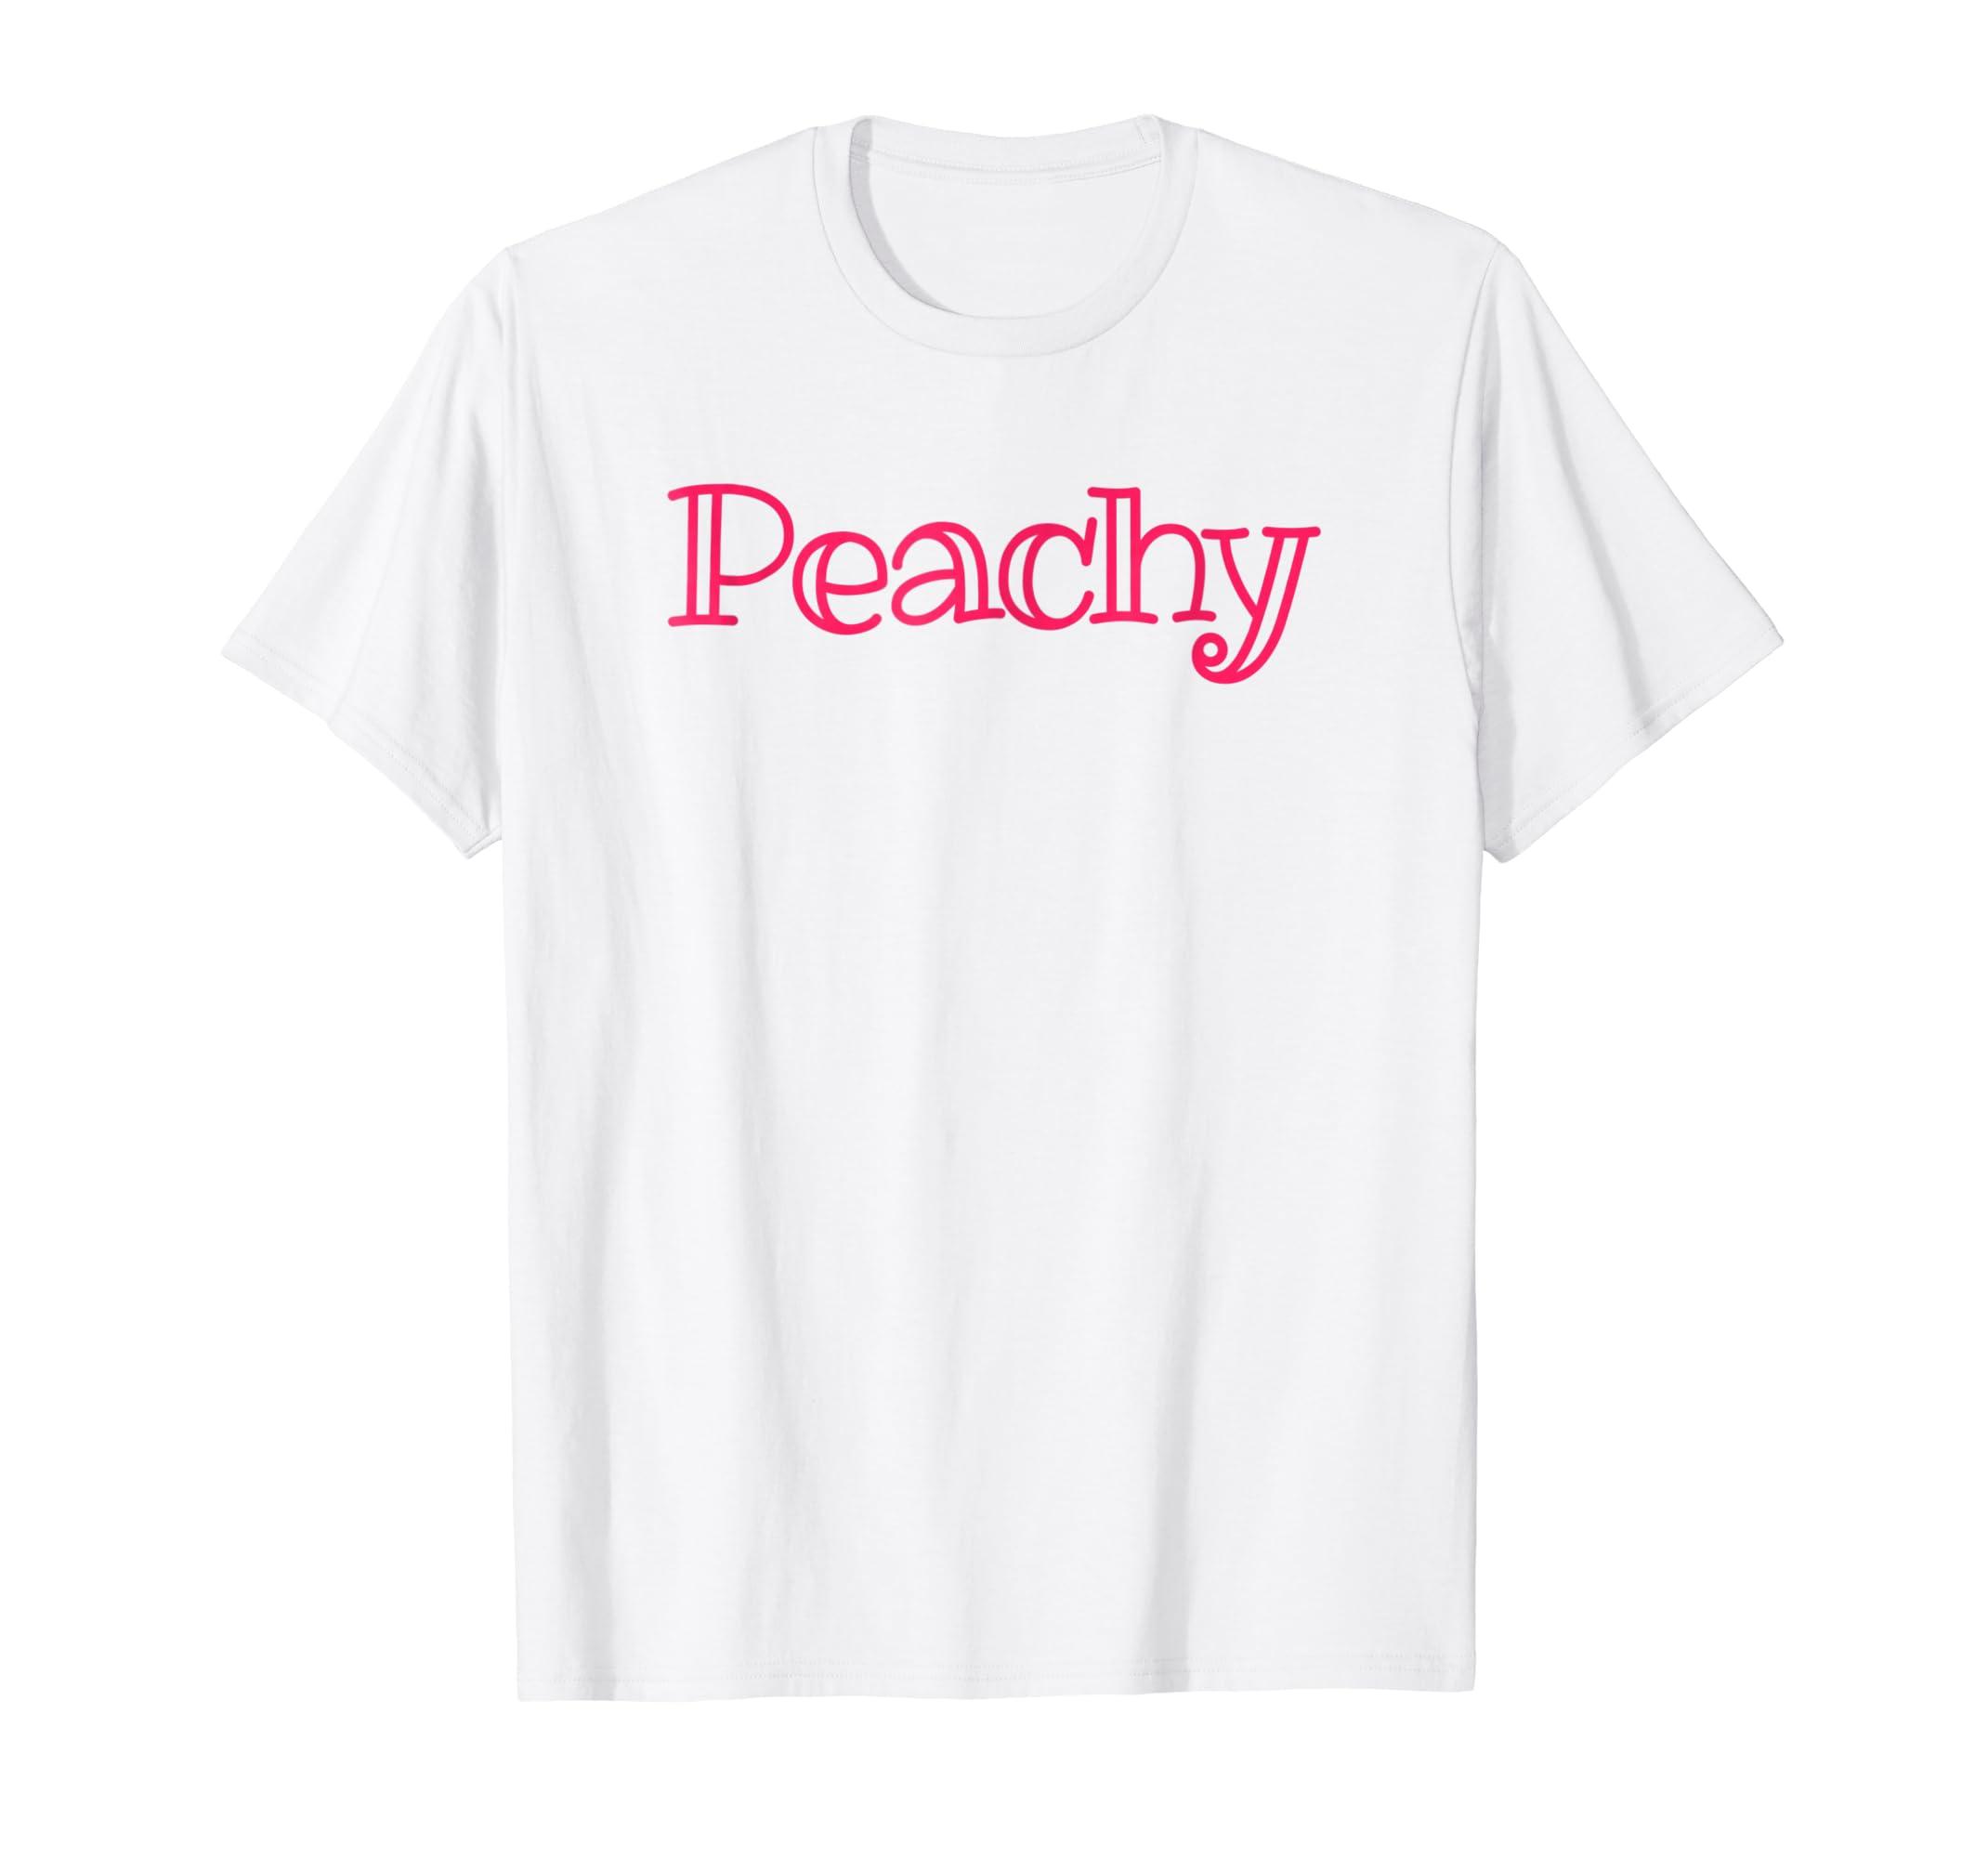 Amazon Peachy Tshirt Cute Retro 60s 70s Hippie Summer Vibe